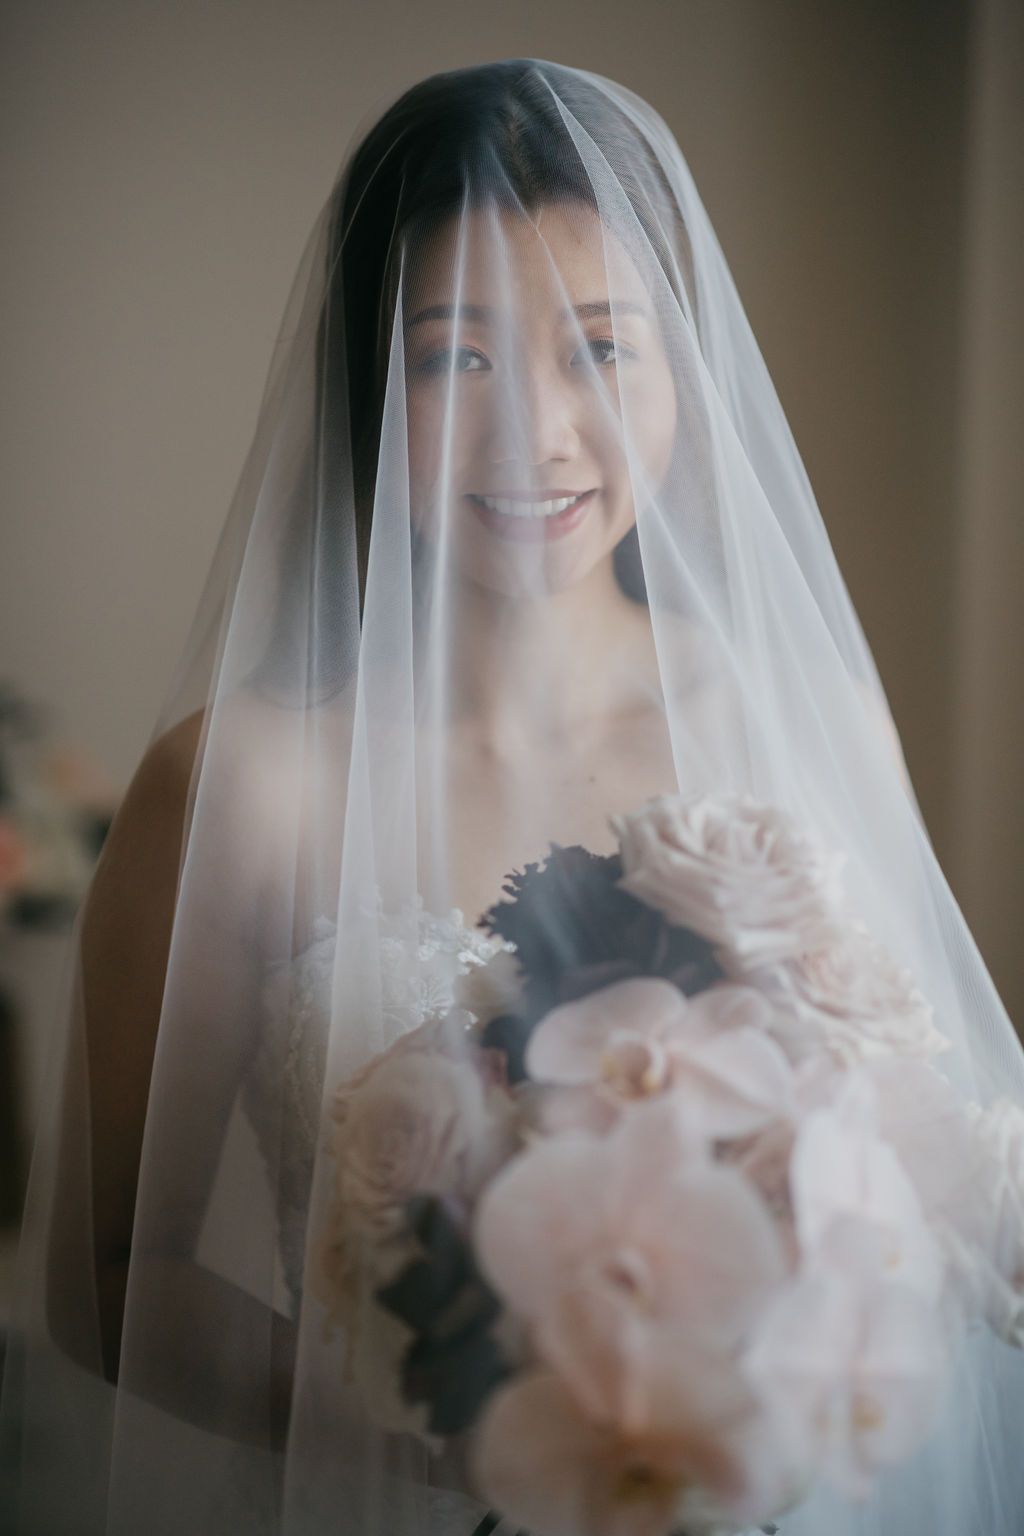 IAM_Yan_Steven_Wedding_443.jpg